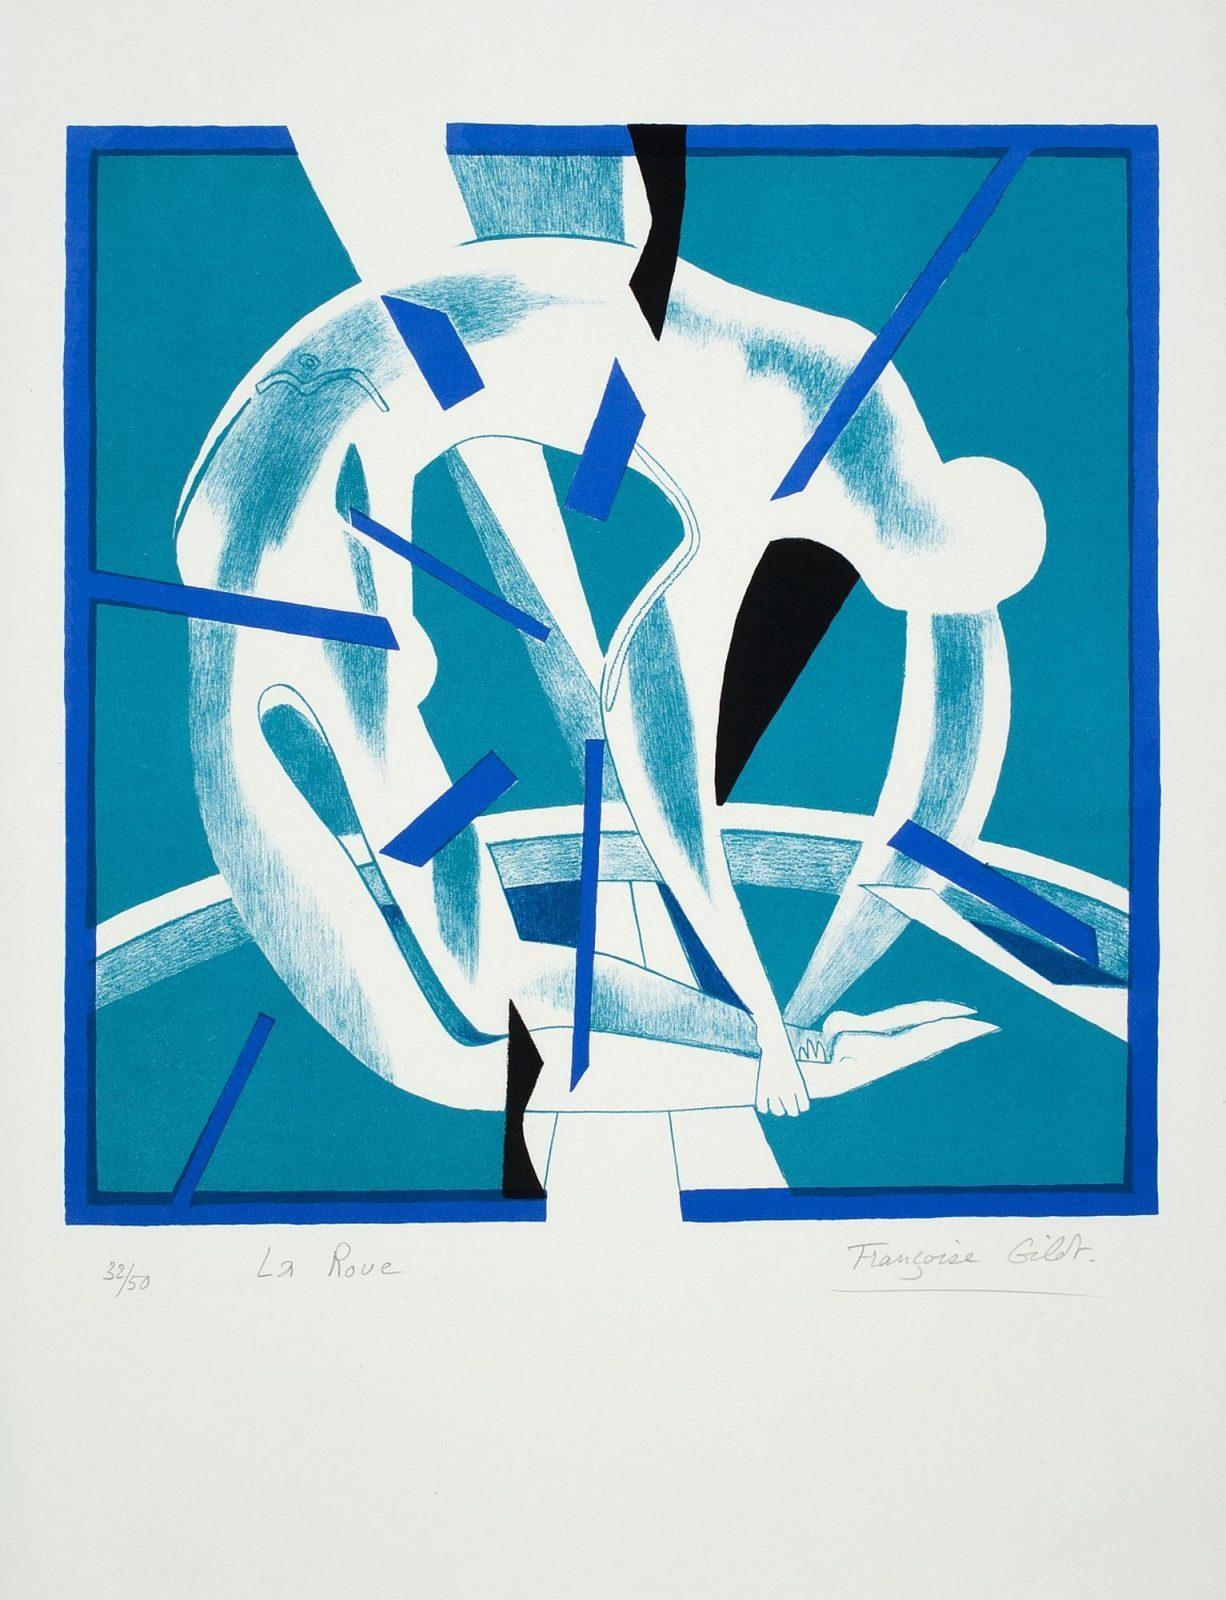 Françoise Gilot: The Wheel